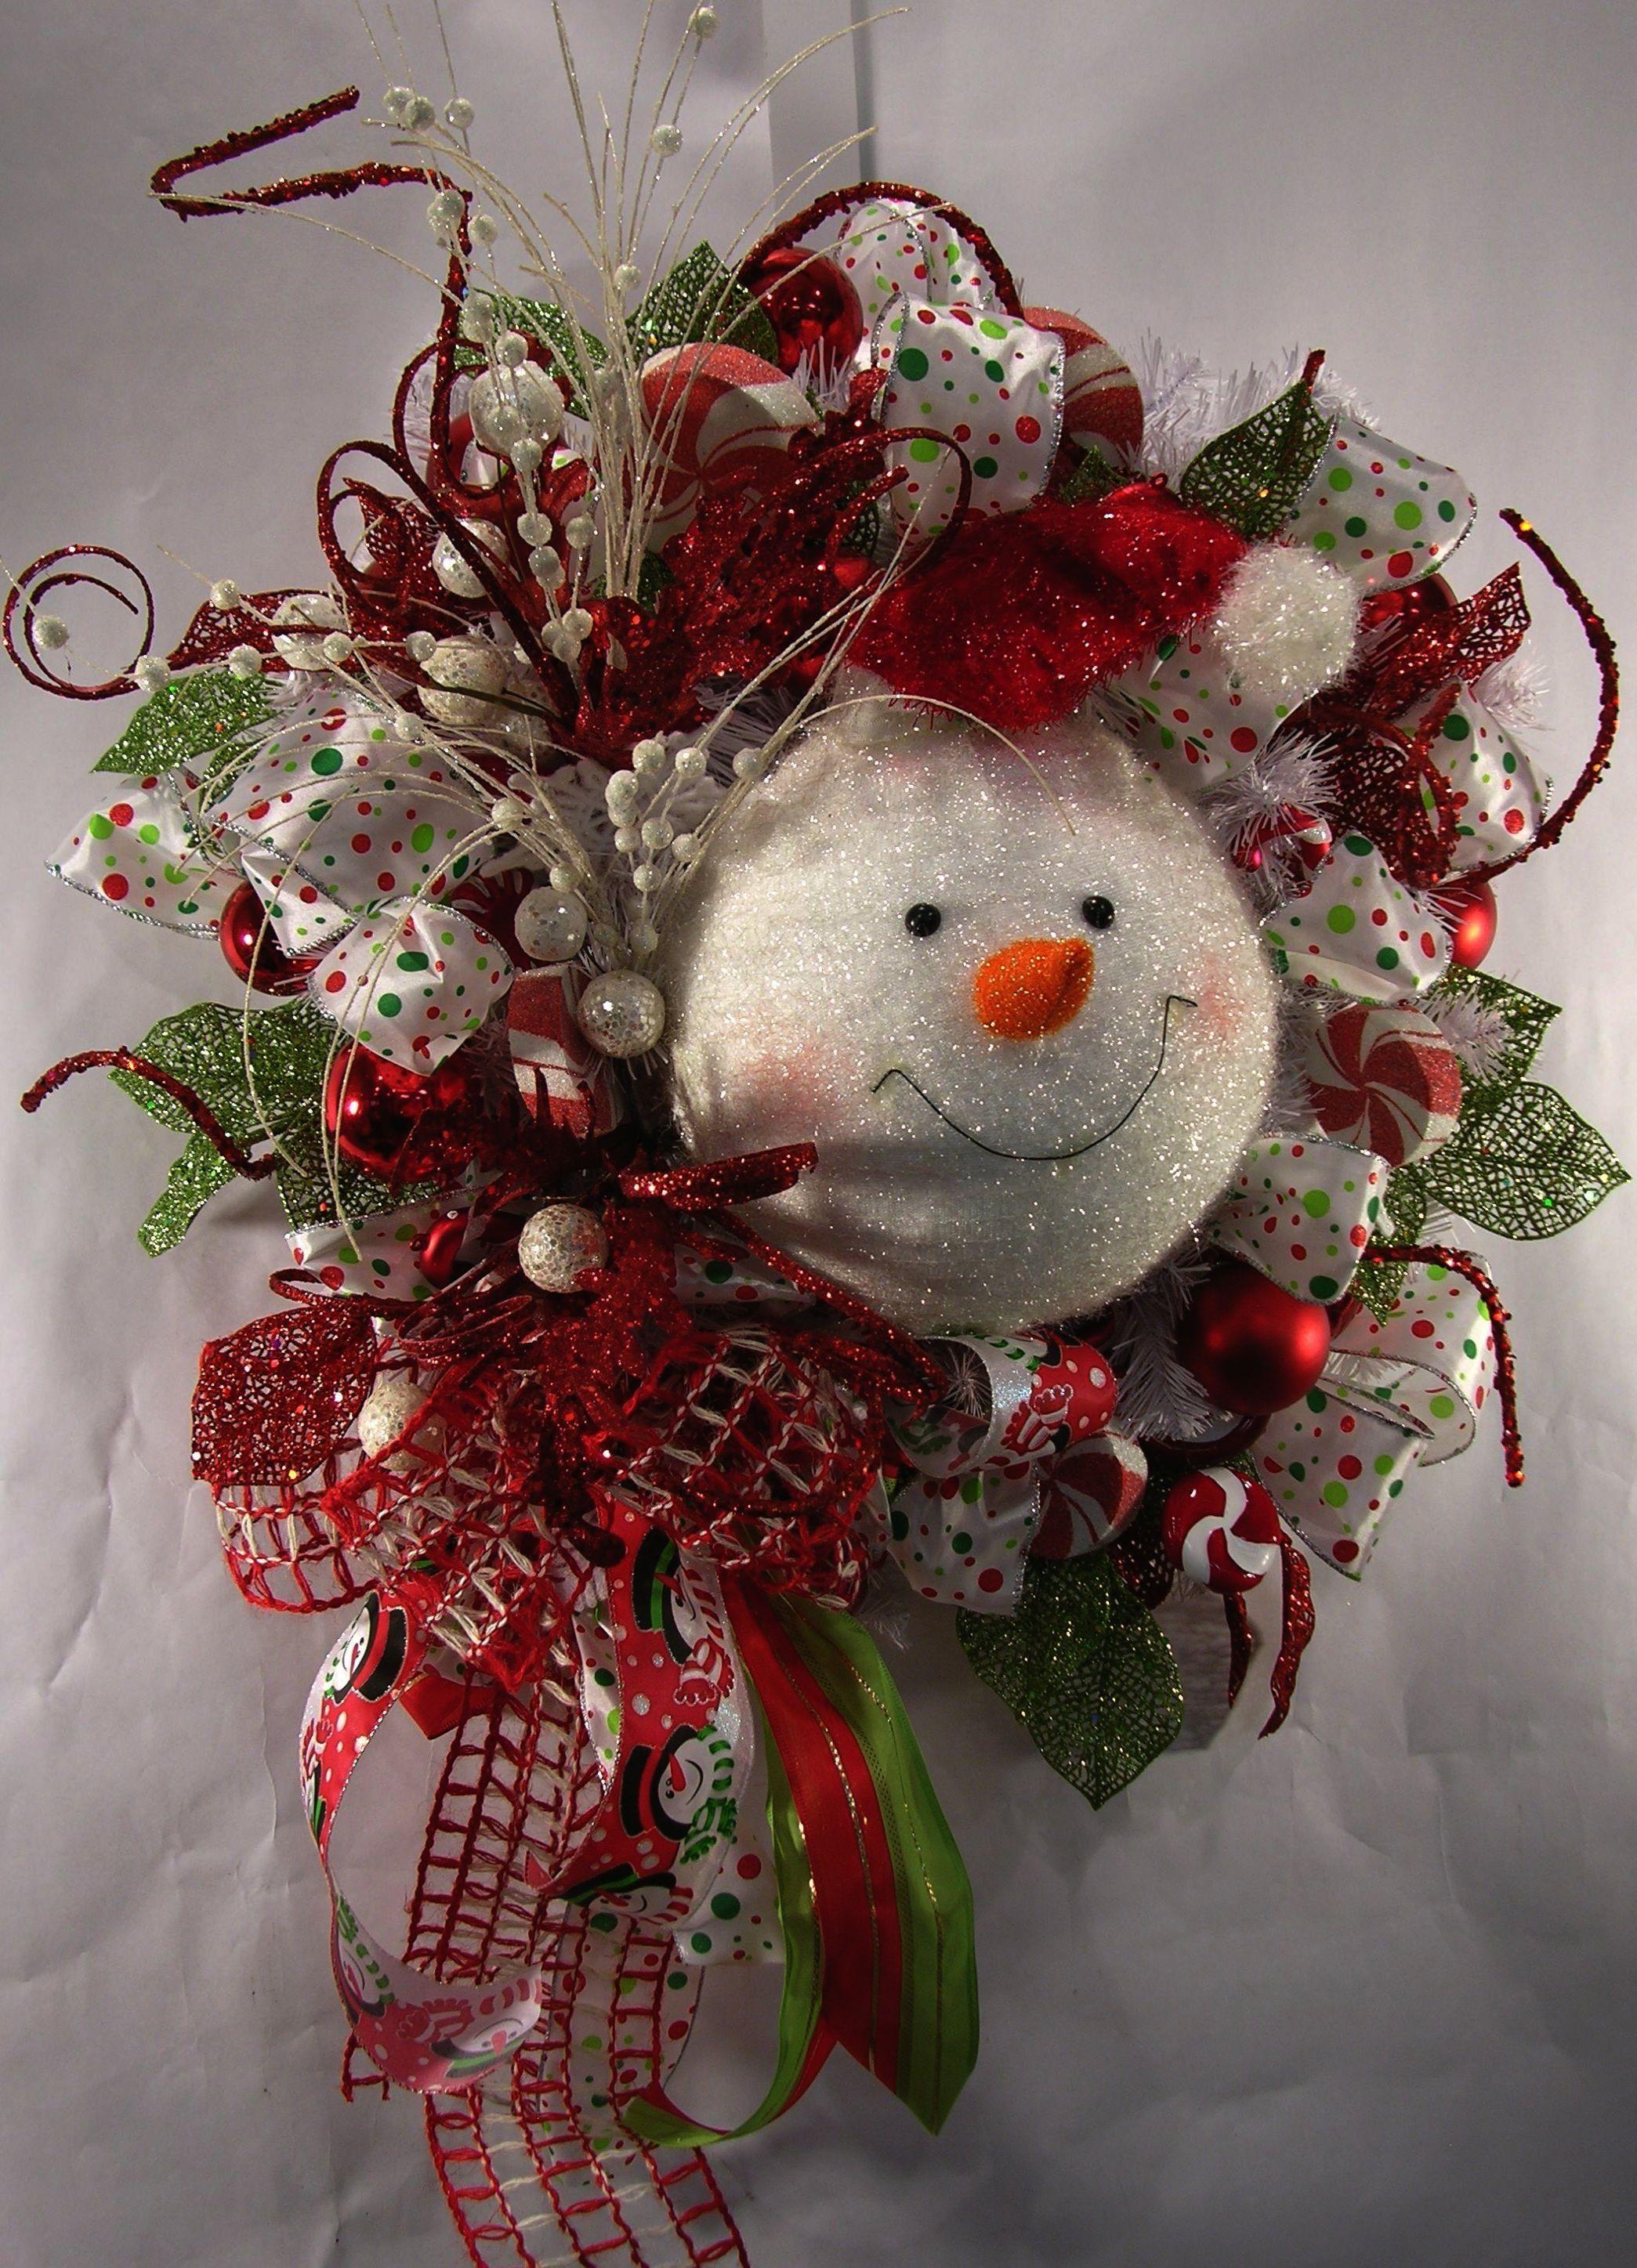 Christmas Wreaths Newcastle Christmas Wreaths B And Q Christmas Wreaths Diy Christmas Wreaths Christmas Decorations